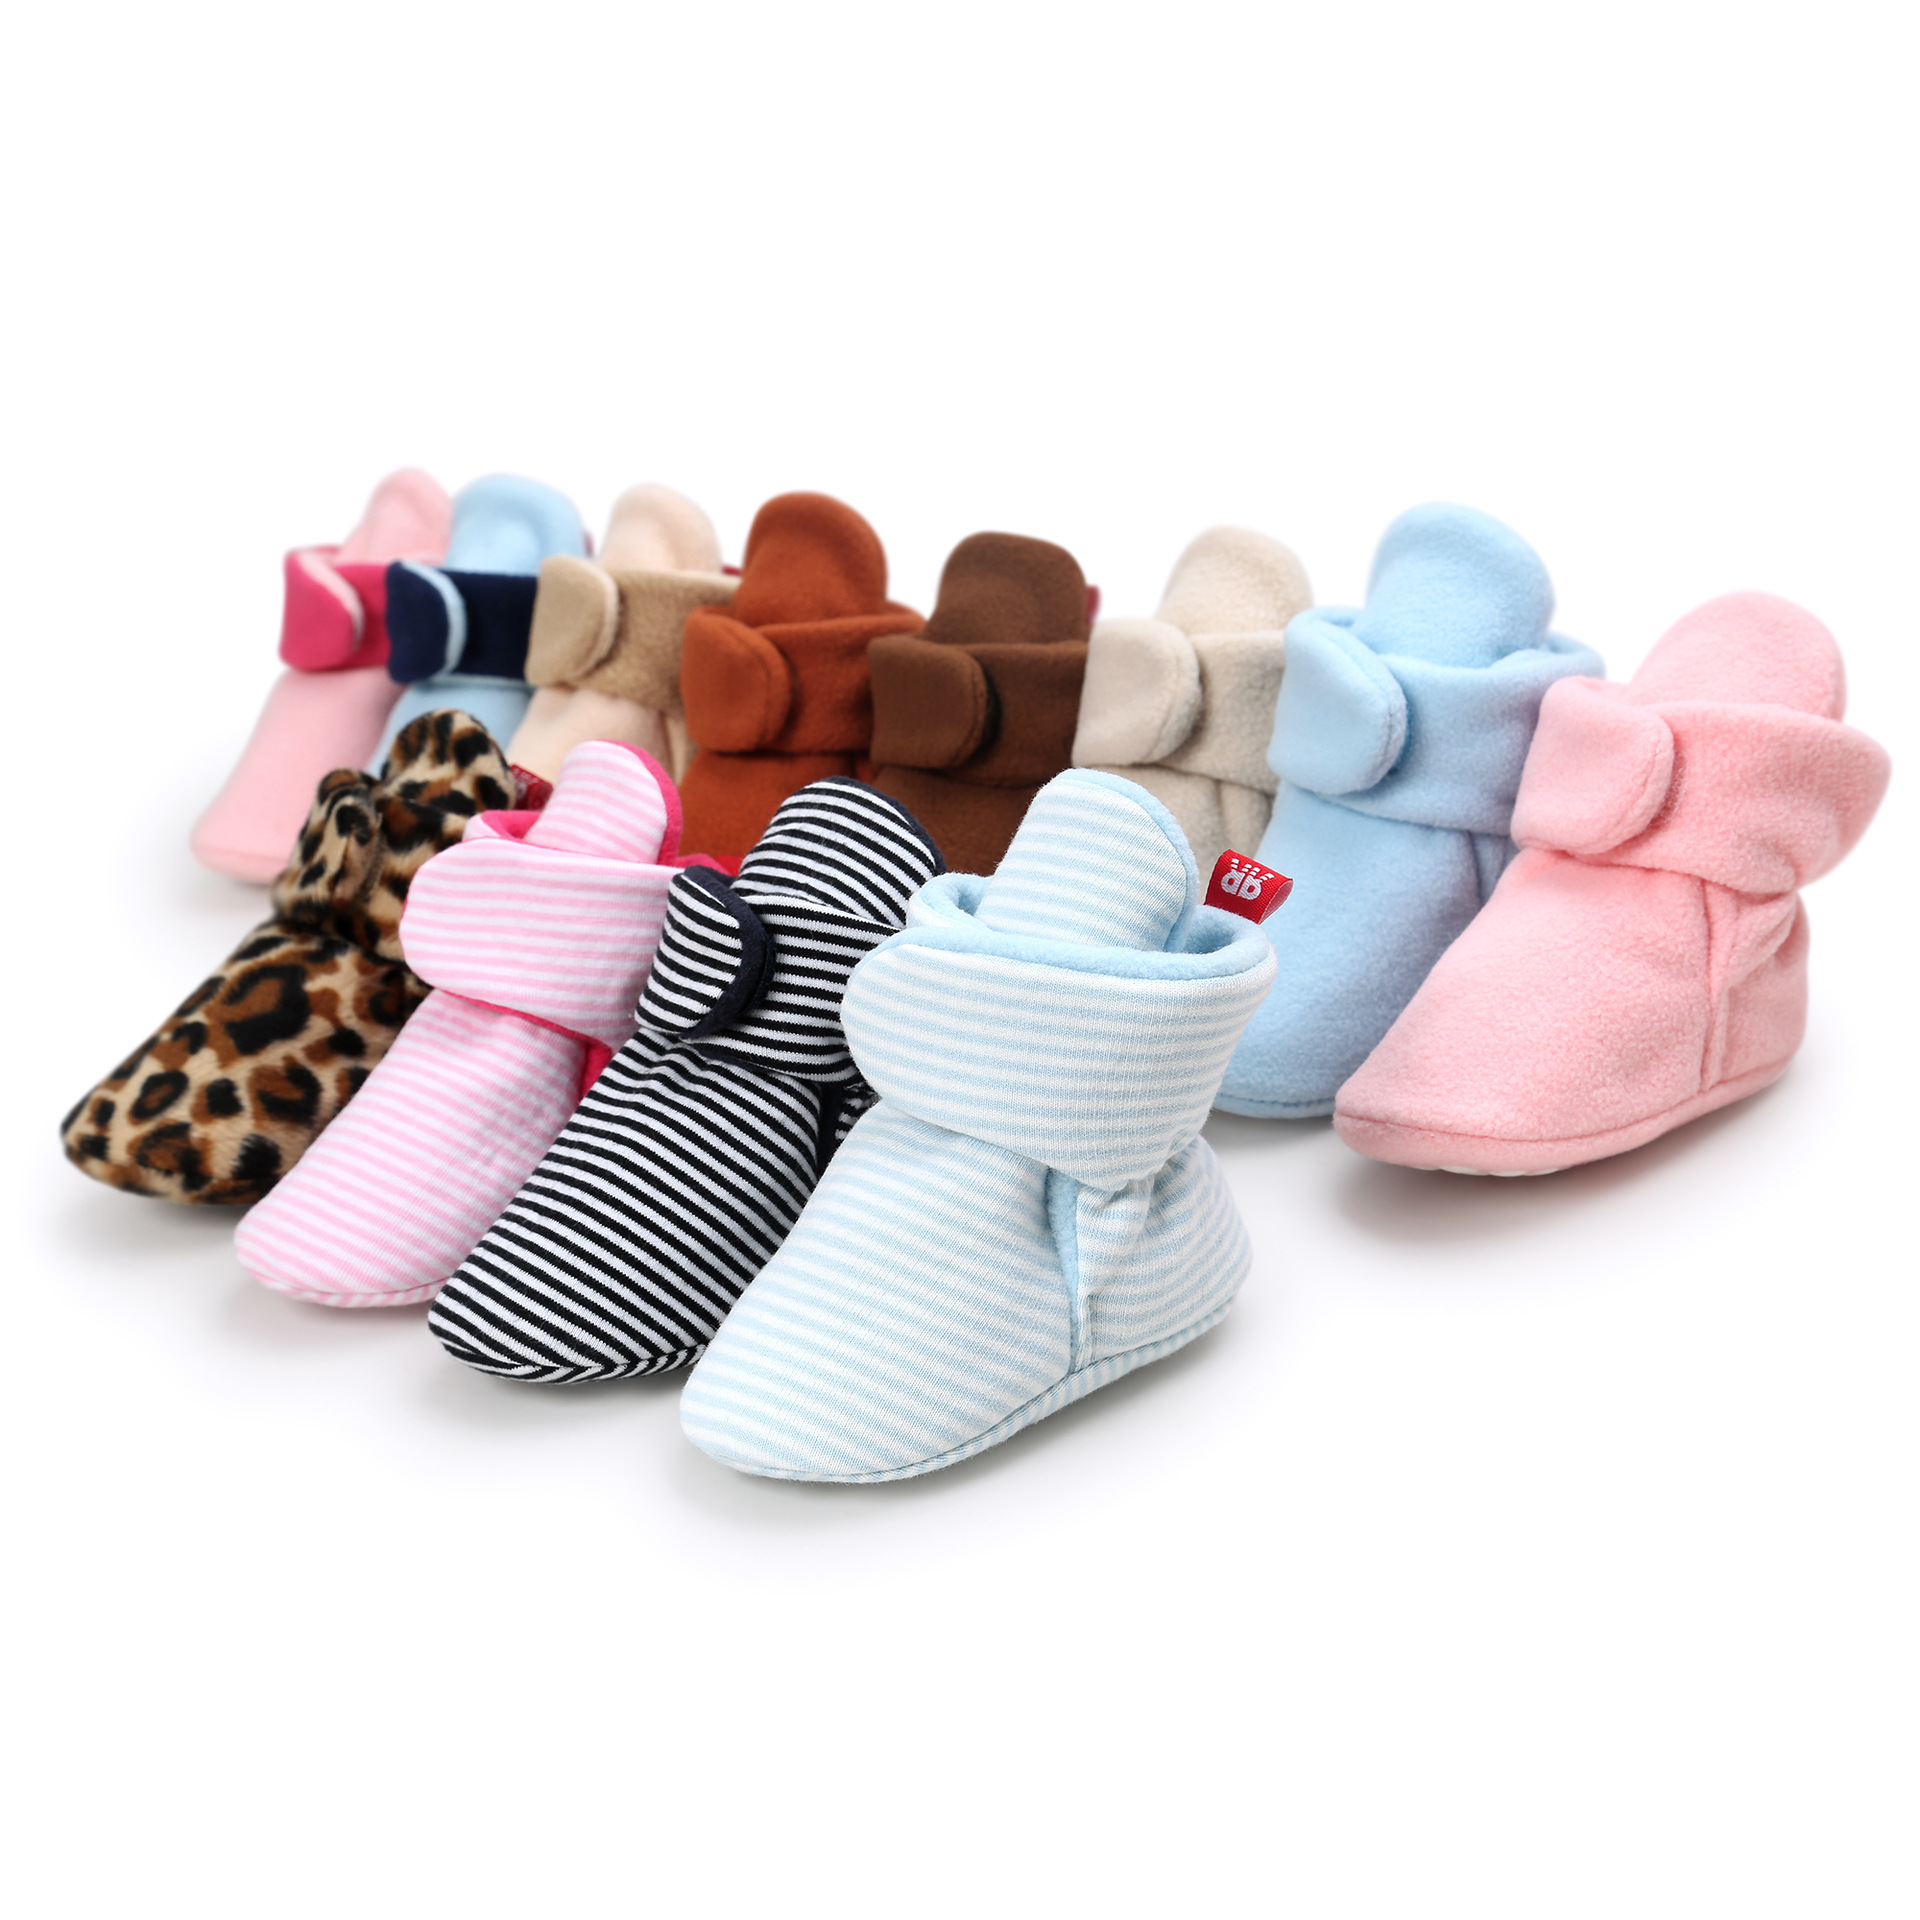 Baby Boys Girls Boots Shoes Newborn Infant Cotton Soft Anti-slip Warm Fleece Booties Warm Winter Socks Slippers Crib Shoes